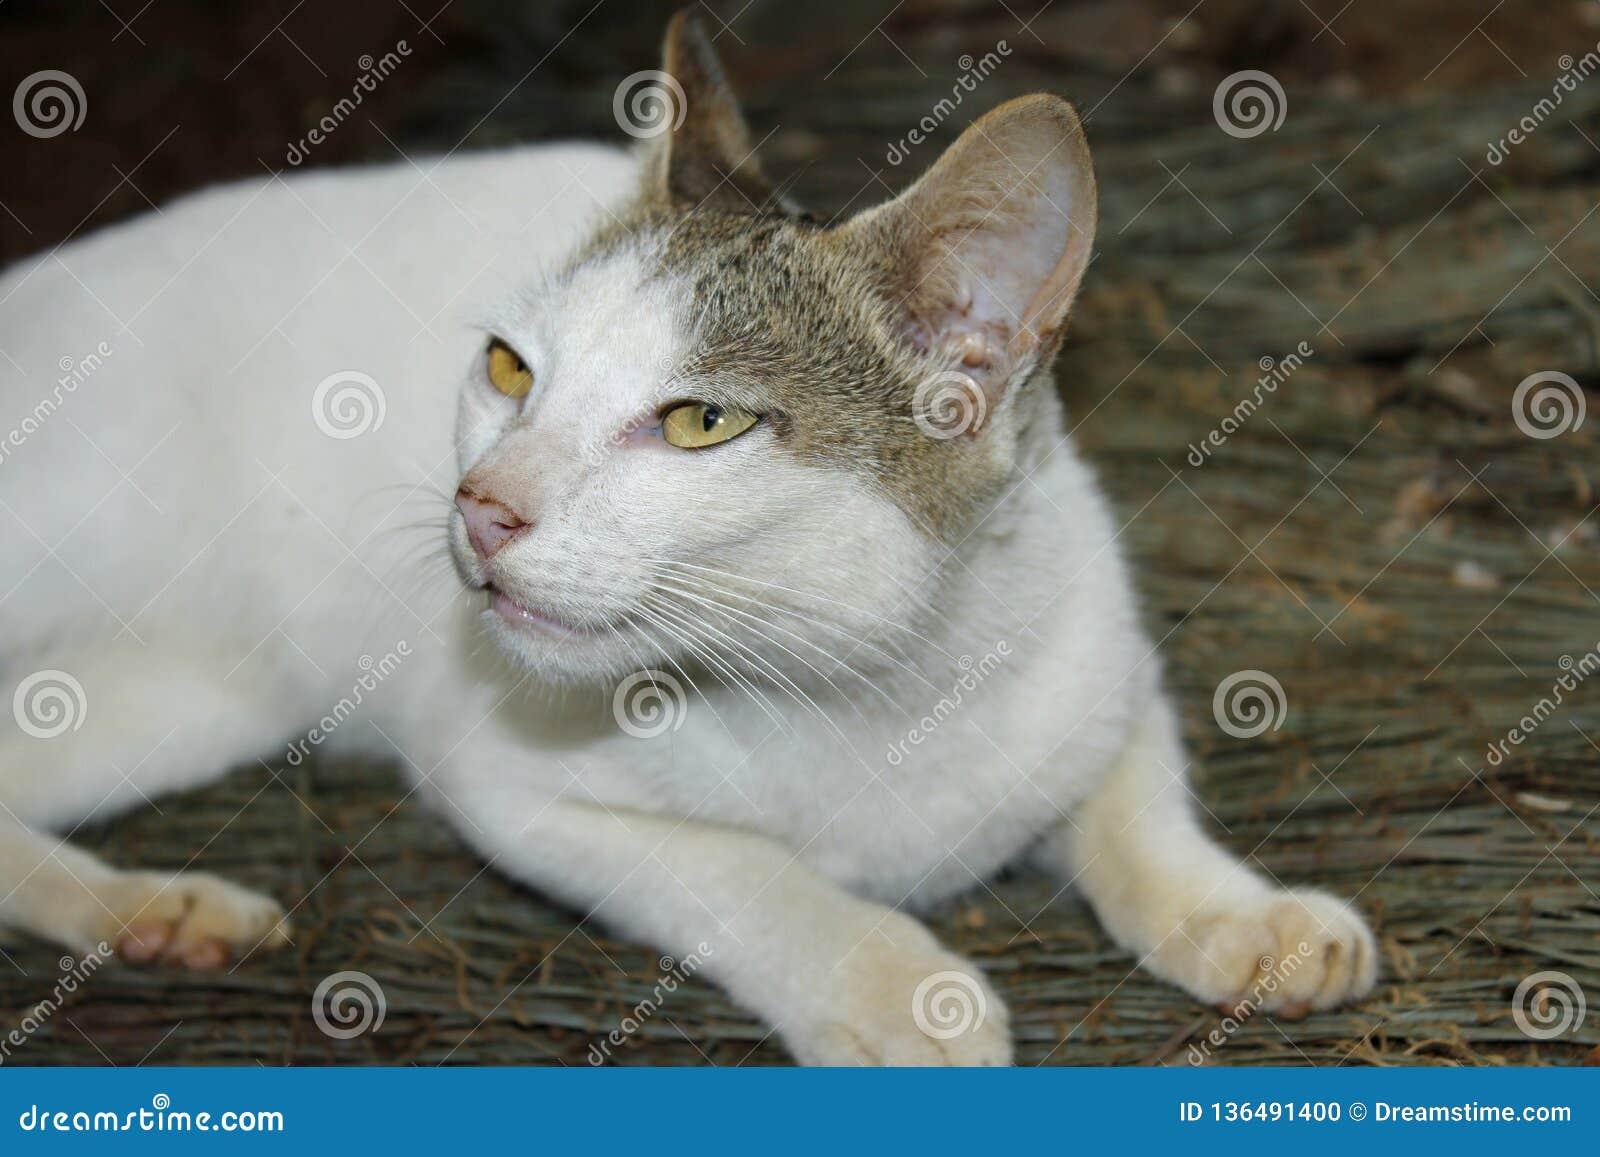 Crying cute white cat